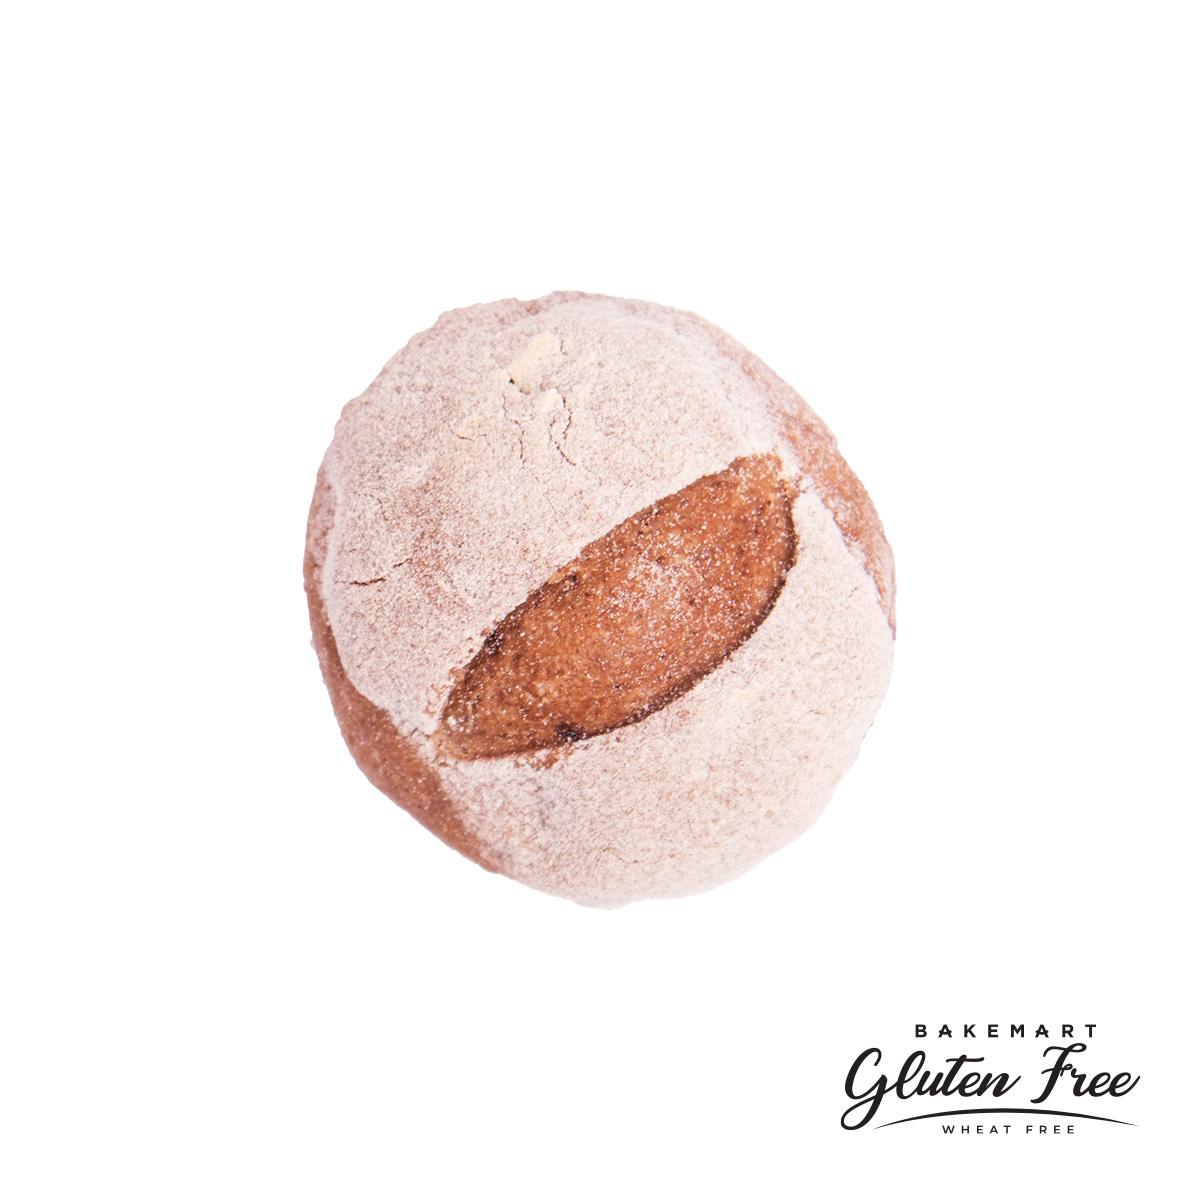 Gluten-Free-Artisan-bread-rolls-Bakemart-Gourmet-Online